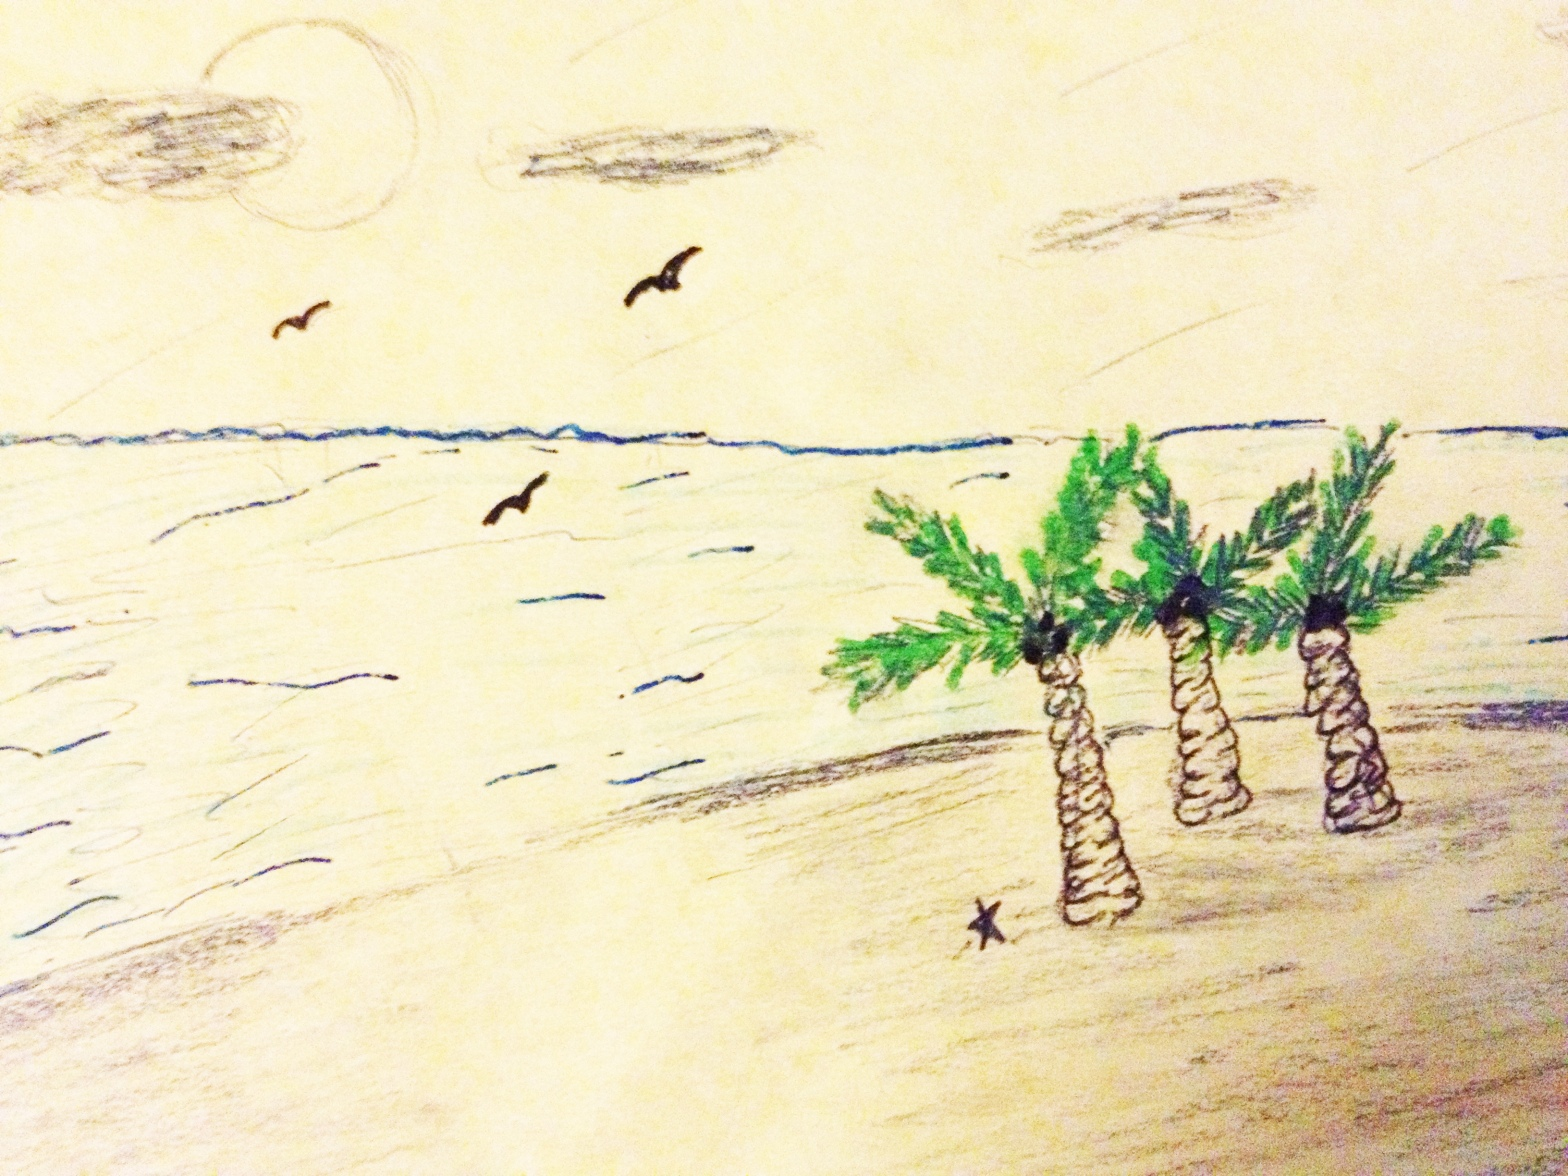 Sketch of a beach